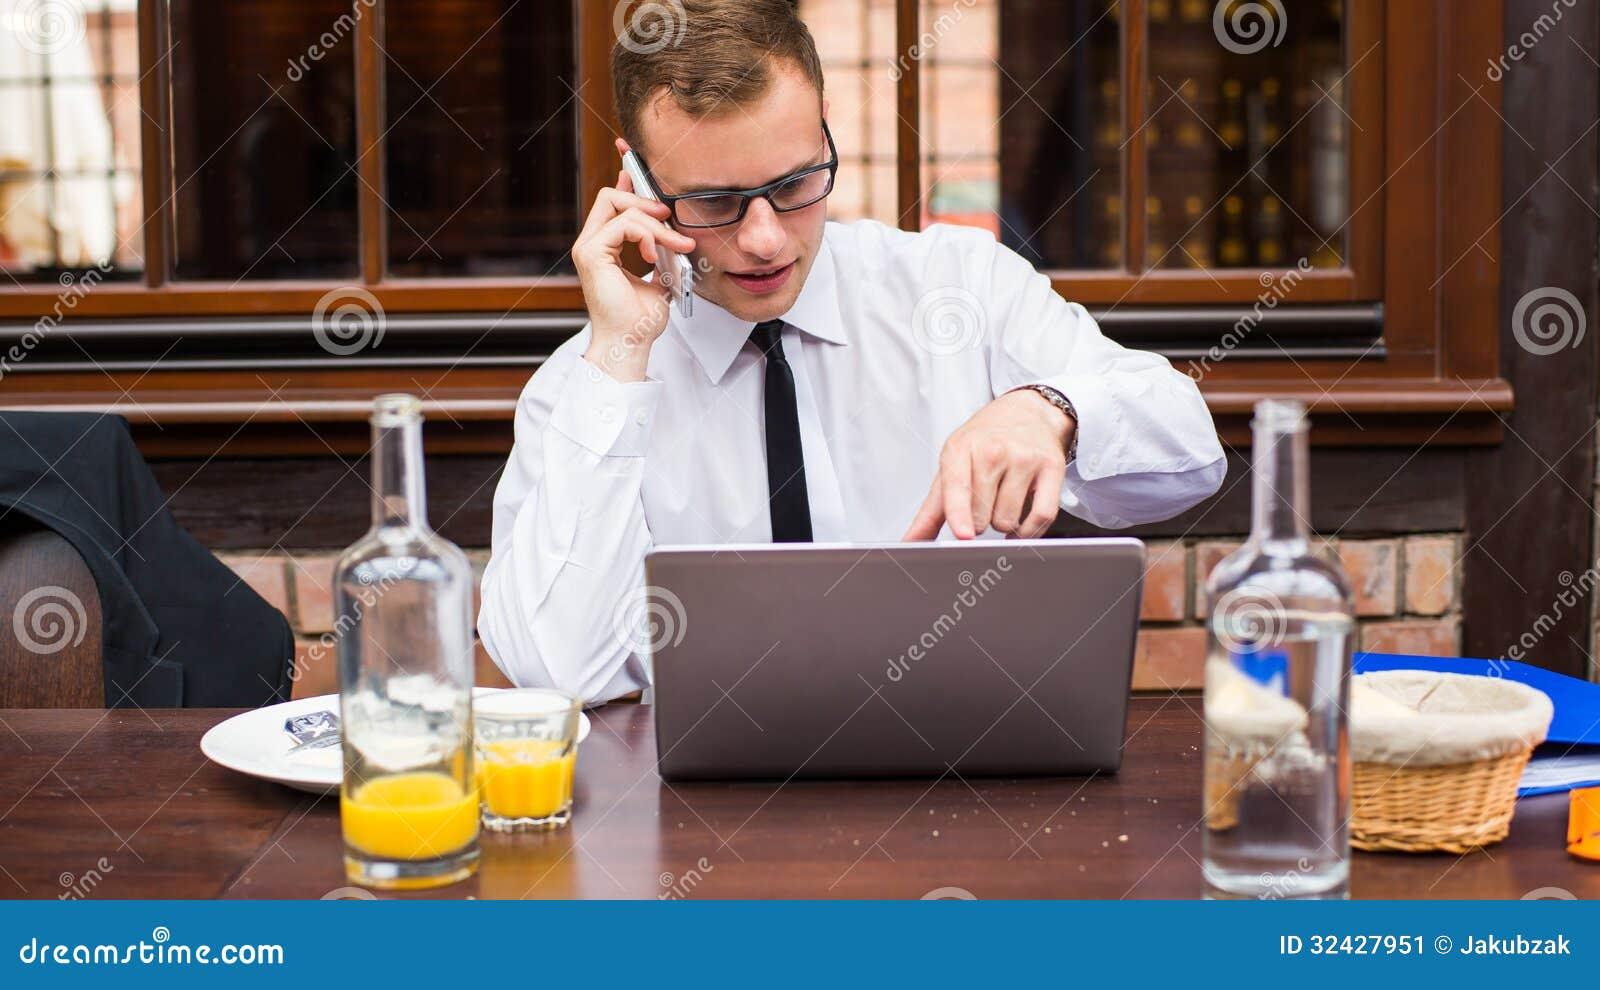 Hard Working Businessman In Restaurant. Stock Image ...